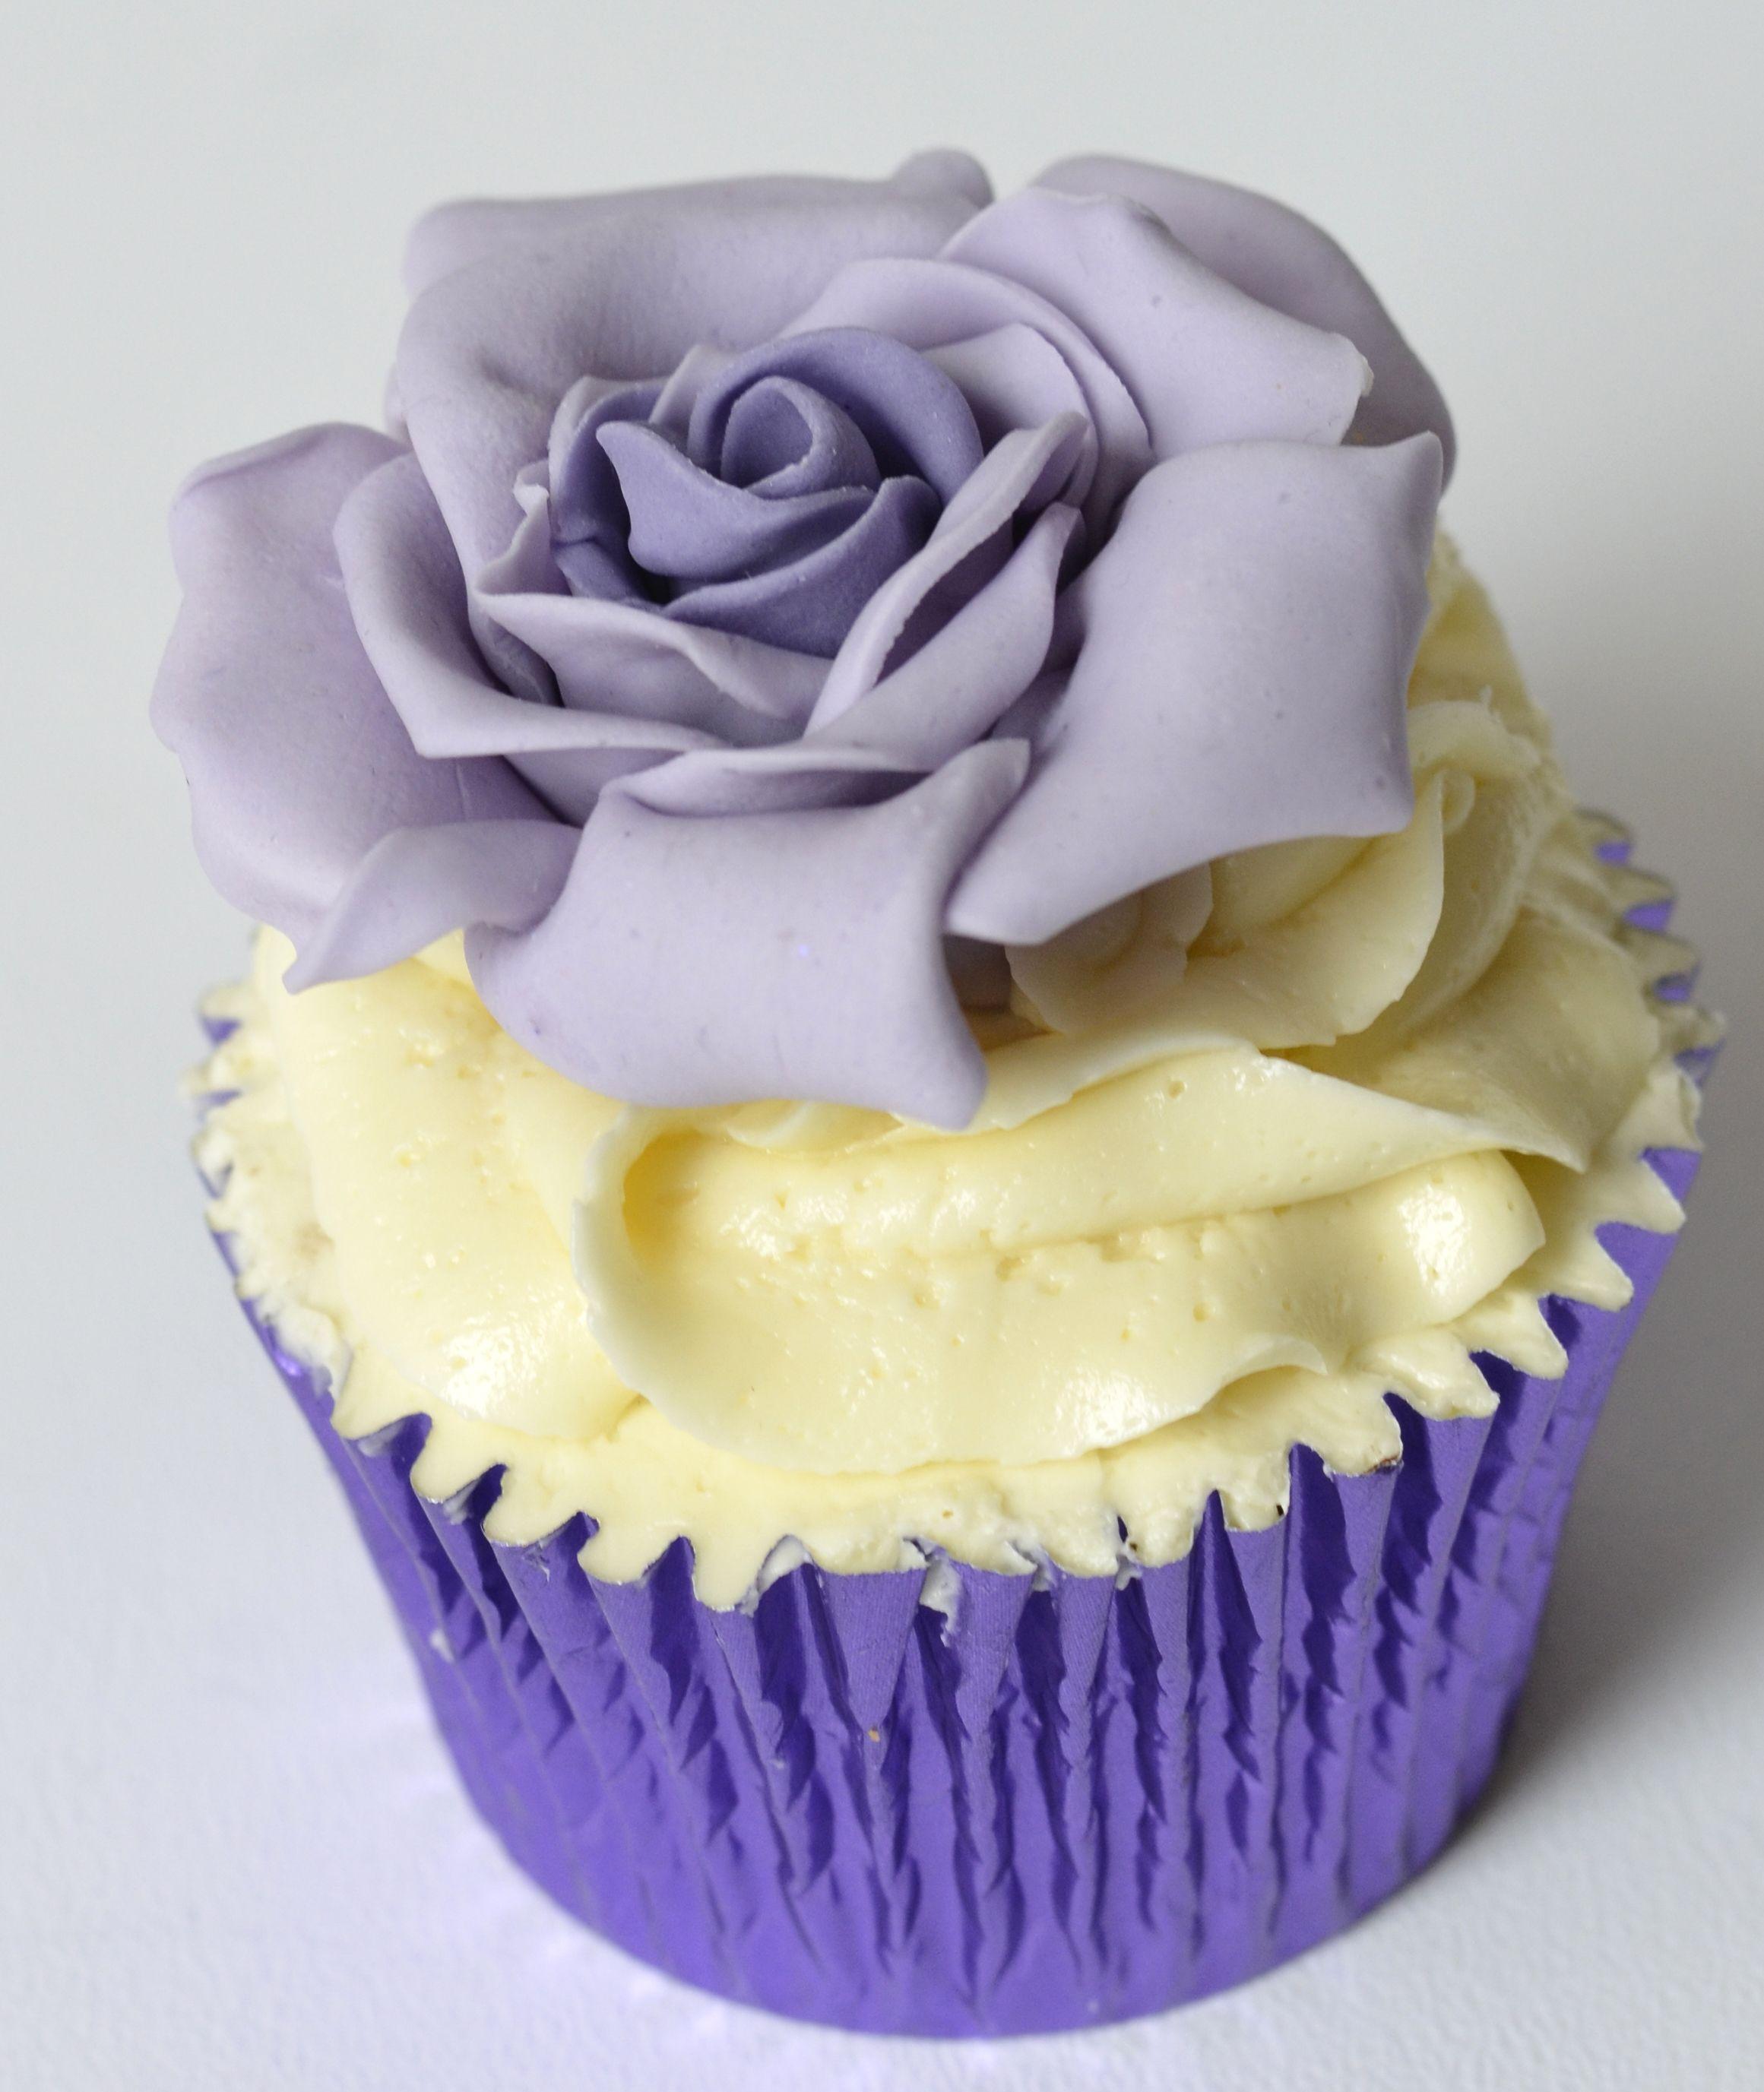 single cupcakes - Google Search | Fancy cupcakes, Cupcake ...